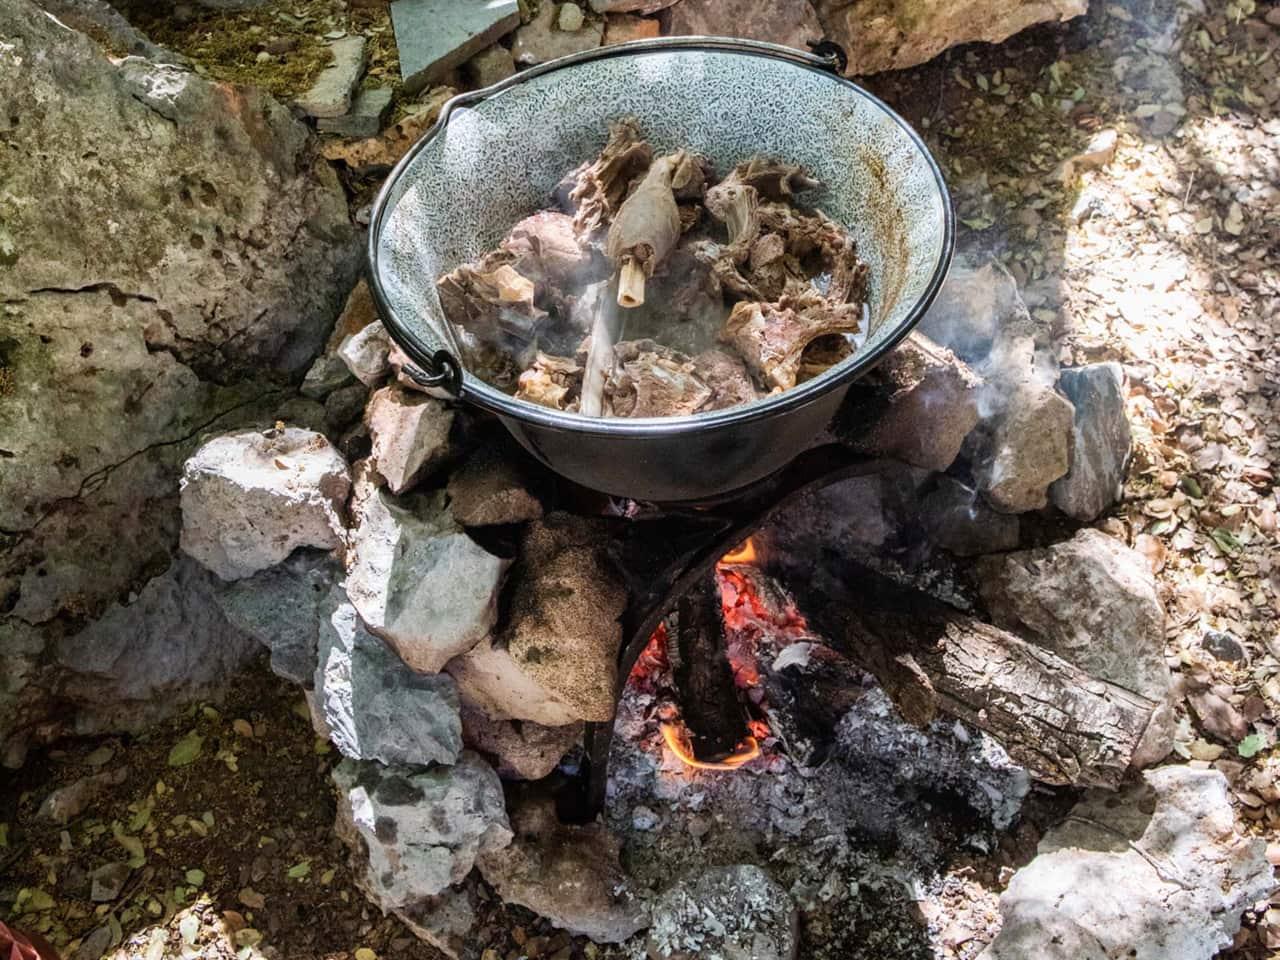 Traditional Cooking Lesson a Mitato Shepherds Hut, kroustas village cooking lesson, kroustas forest jeep safari, kroustas traditional cooking lesson, cretan gastronomy, cretan cheeses, adventurous jeep safari crete, cook like a local crete